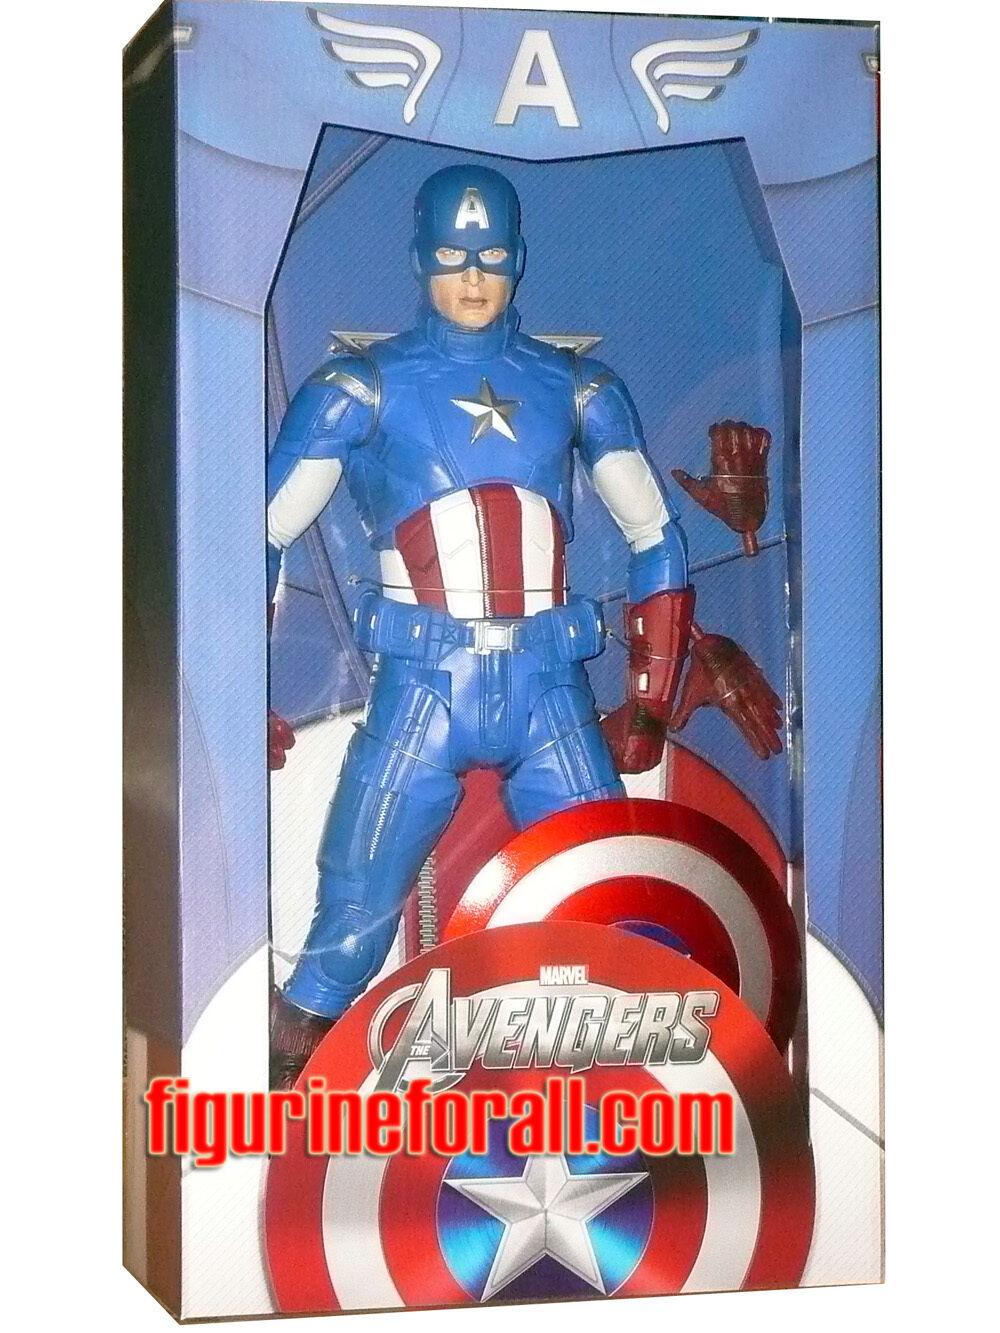 Neca avengers - film  captain america 18 1   4 maßstab actionfigur marvel versiegelt